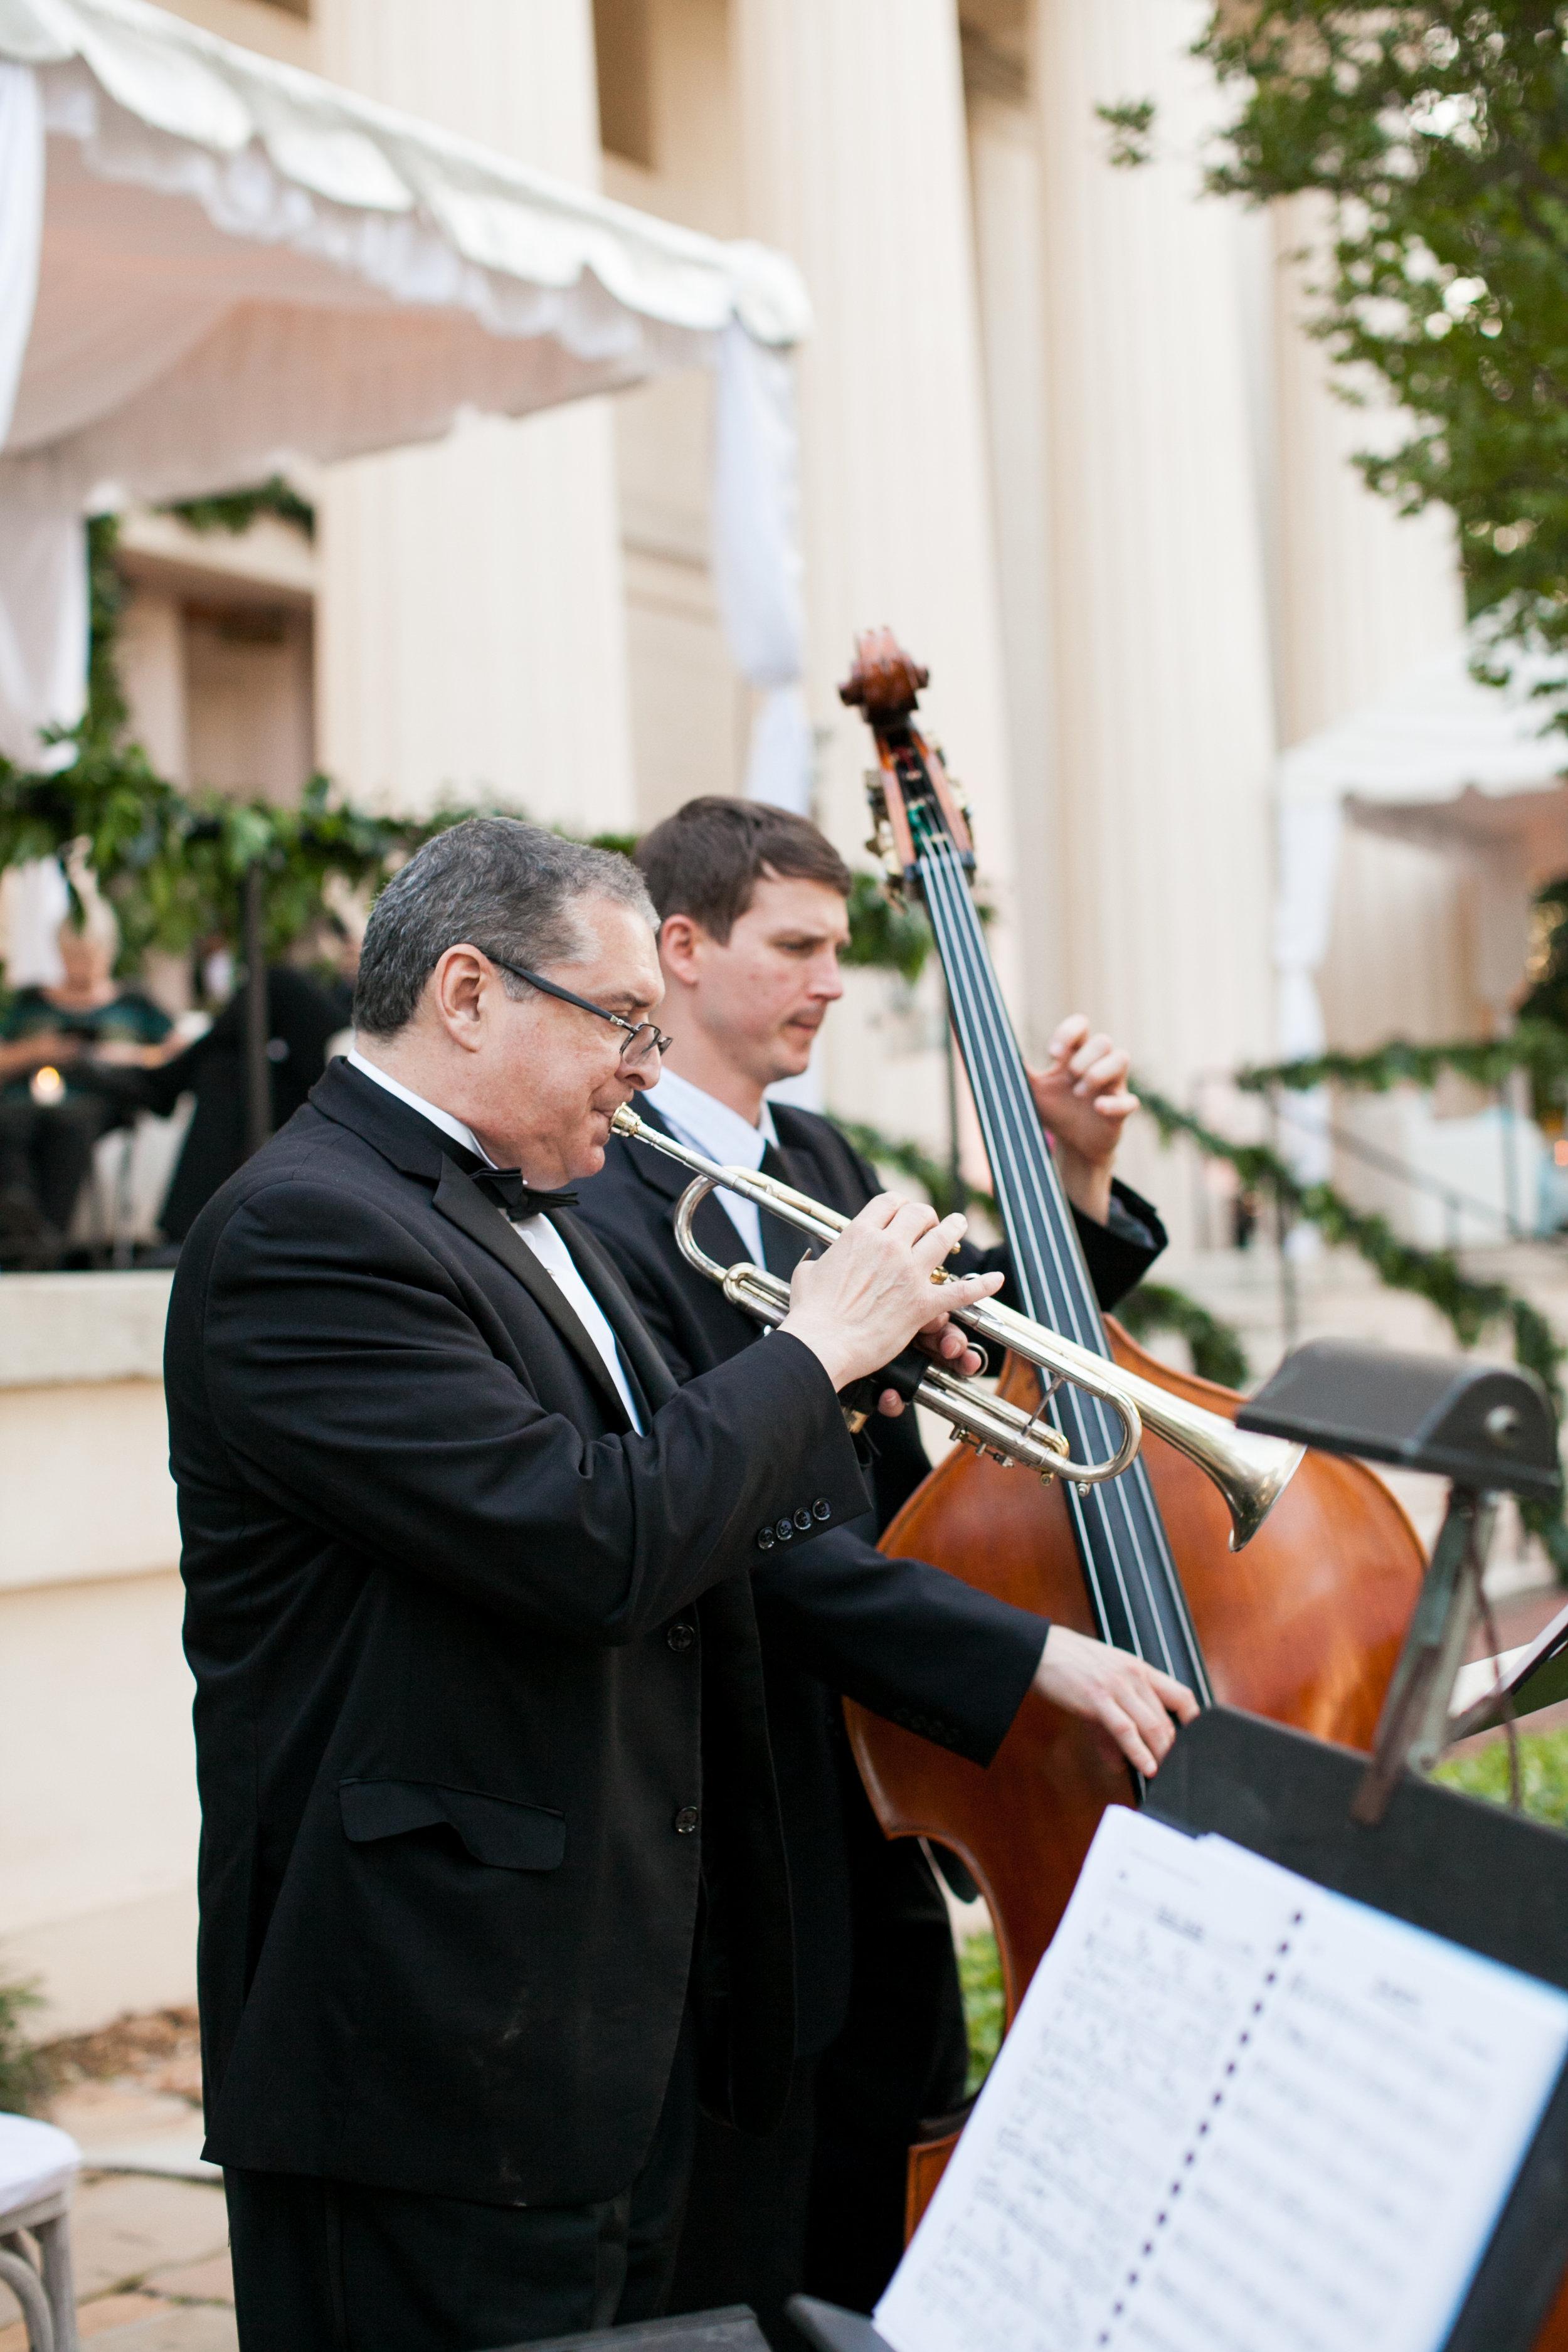 musicians-wedding-reception-greg-boulus-events-augusta-georgia